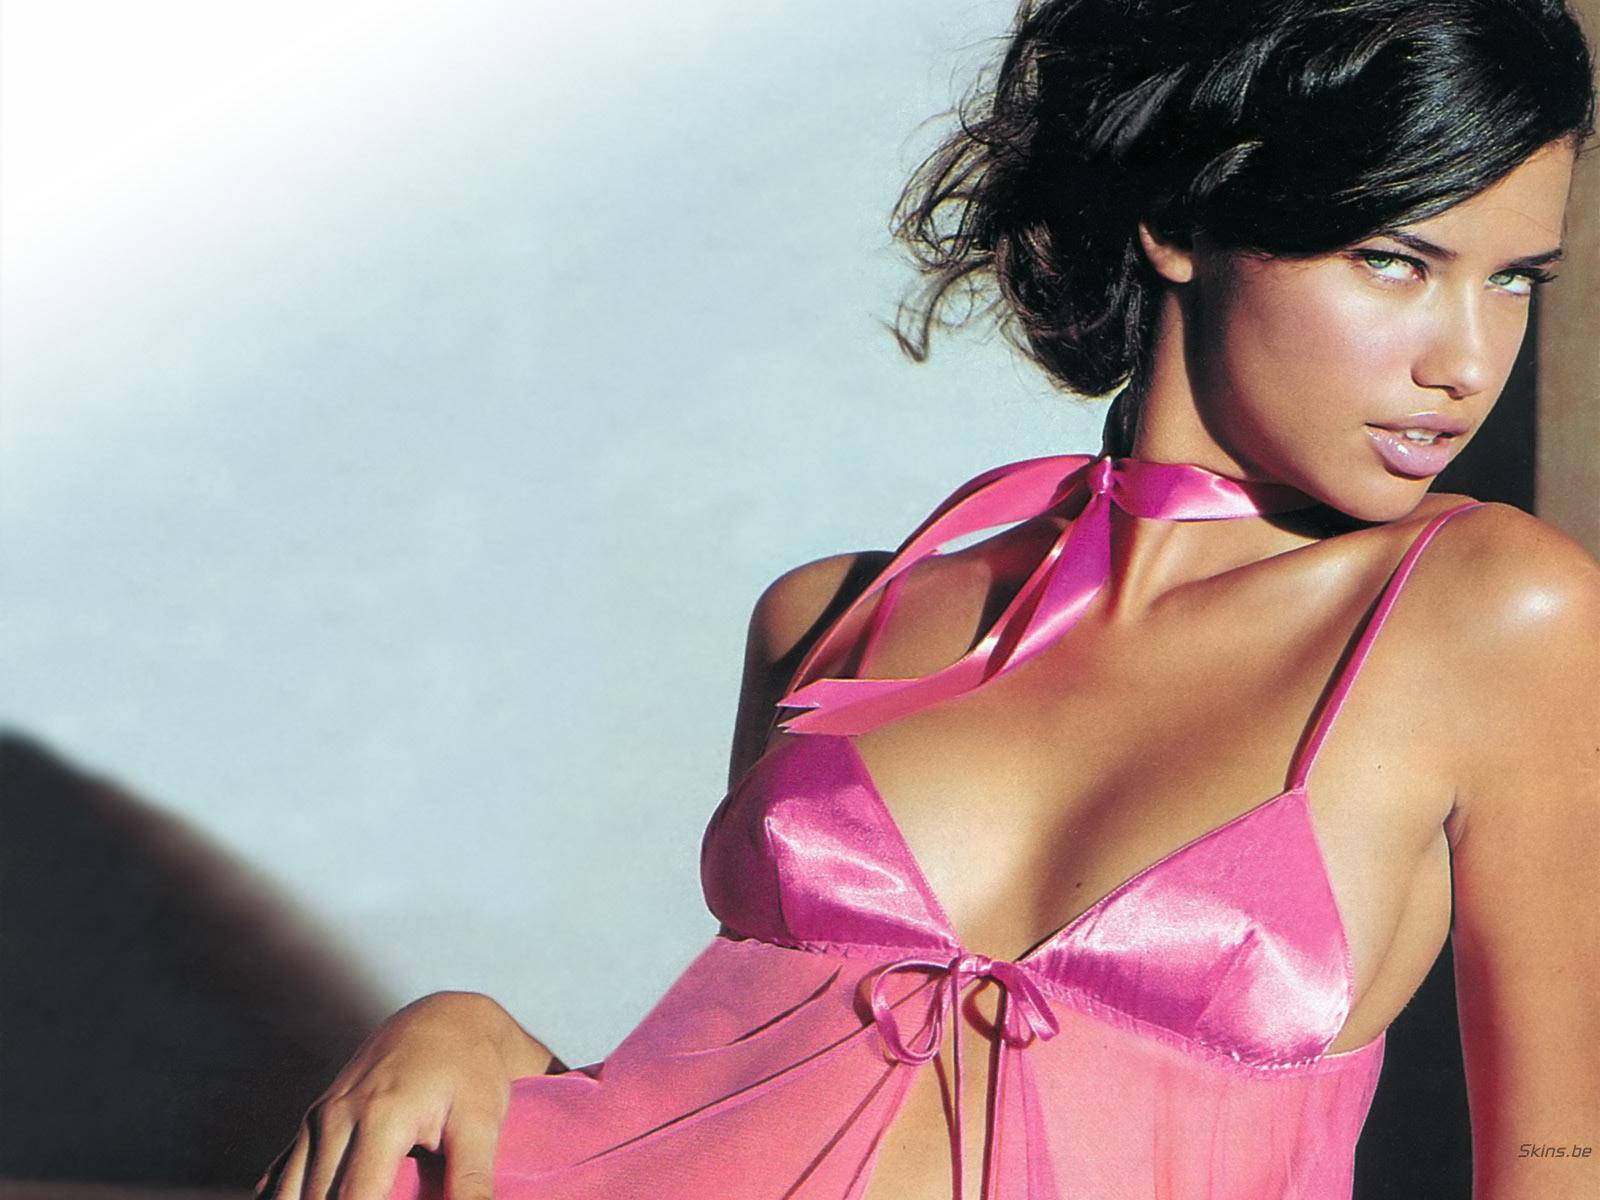 http://3.bp.blogspot.com/-gMEGM6BFSyI/UK3JbpJX_OI/AAAAAAAABf8/iF7gdBXoex4/s1600/Adriana+Lima+Hot+2012_6.jpg